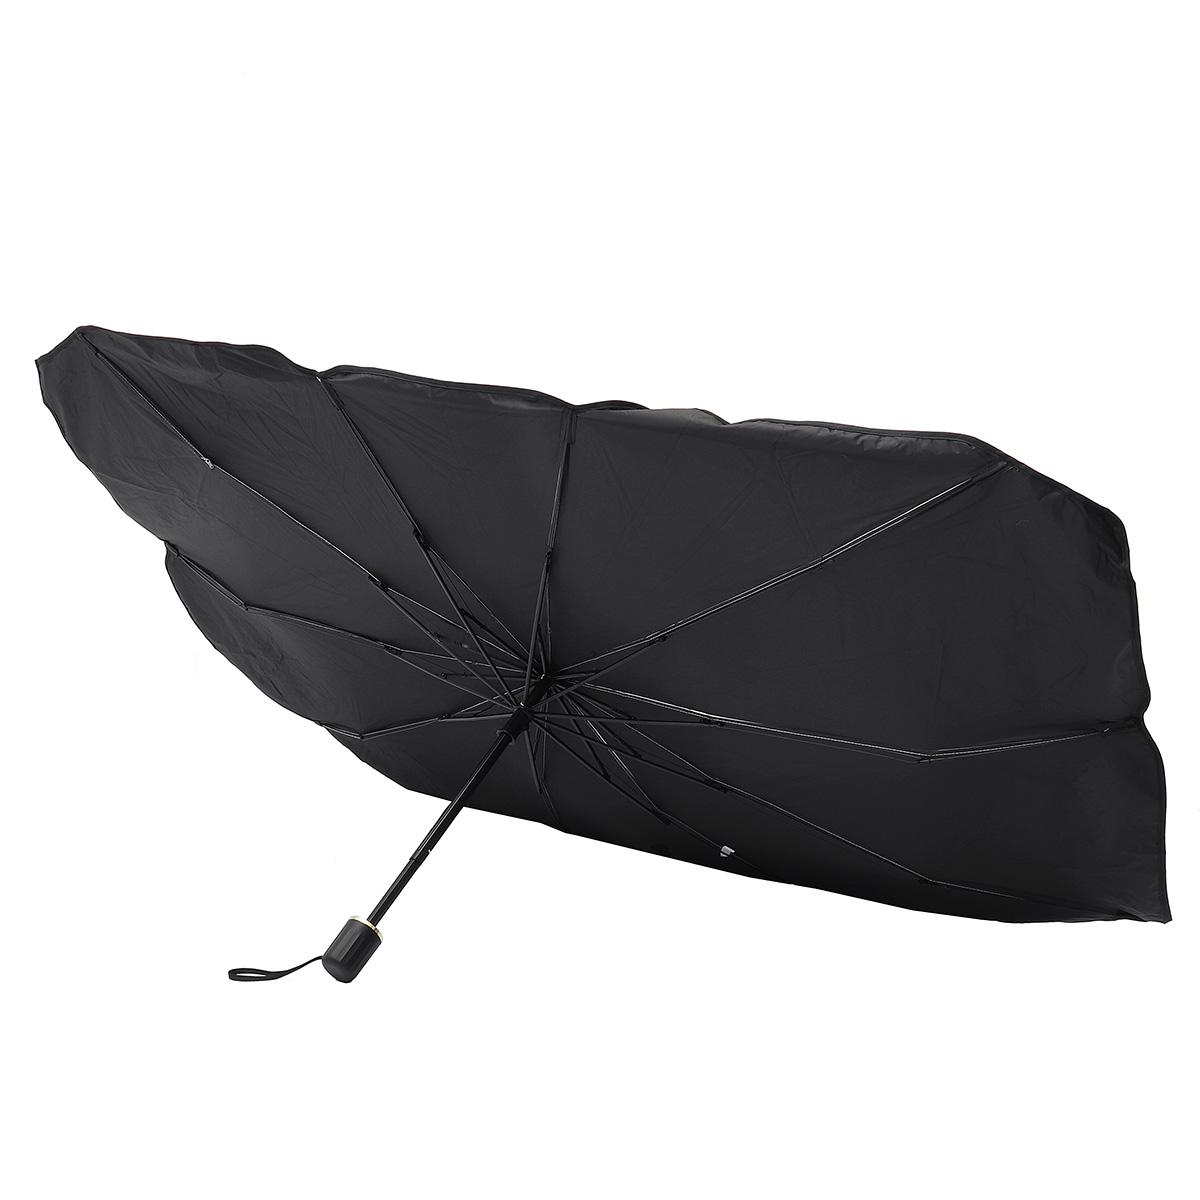 Car Umbrella Shape Sun Shade Parasol Auto Front Window Sunshade Covers Anti UV